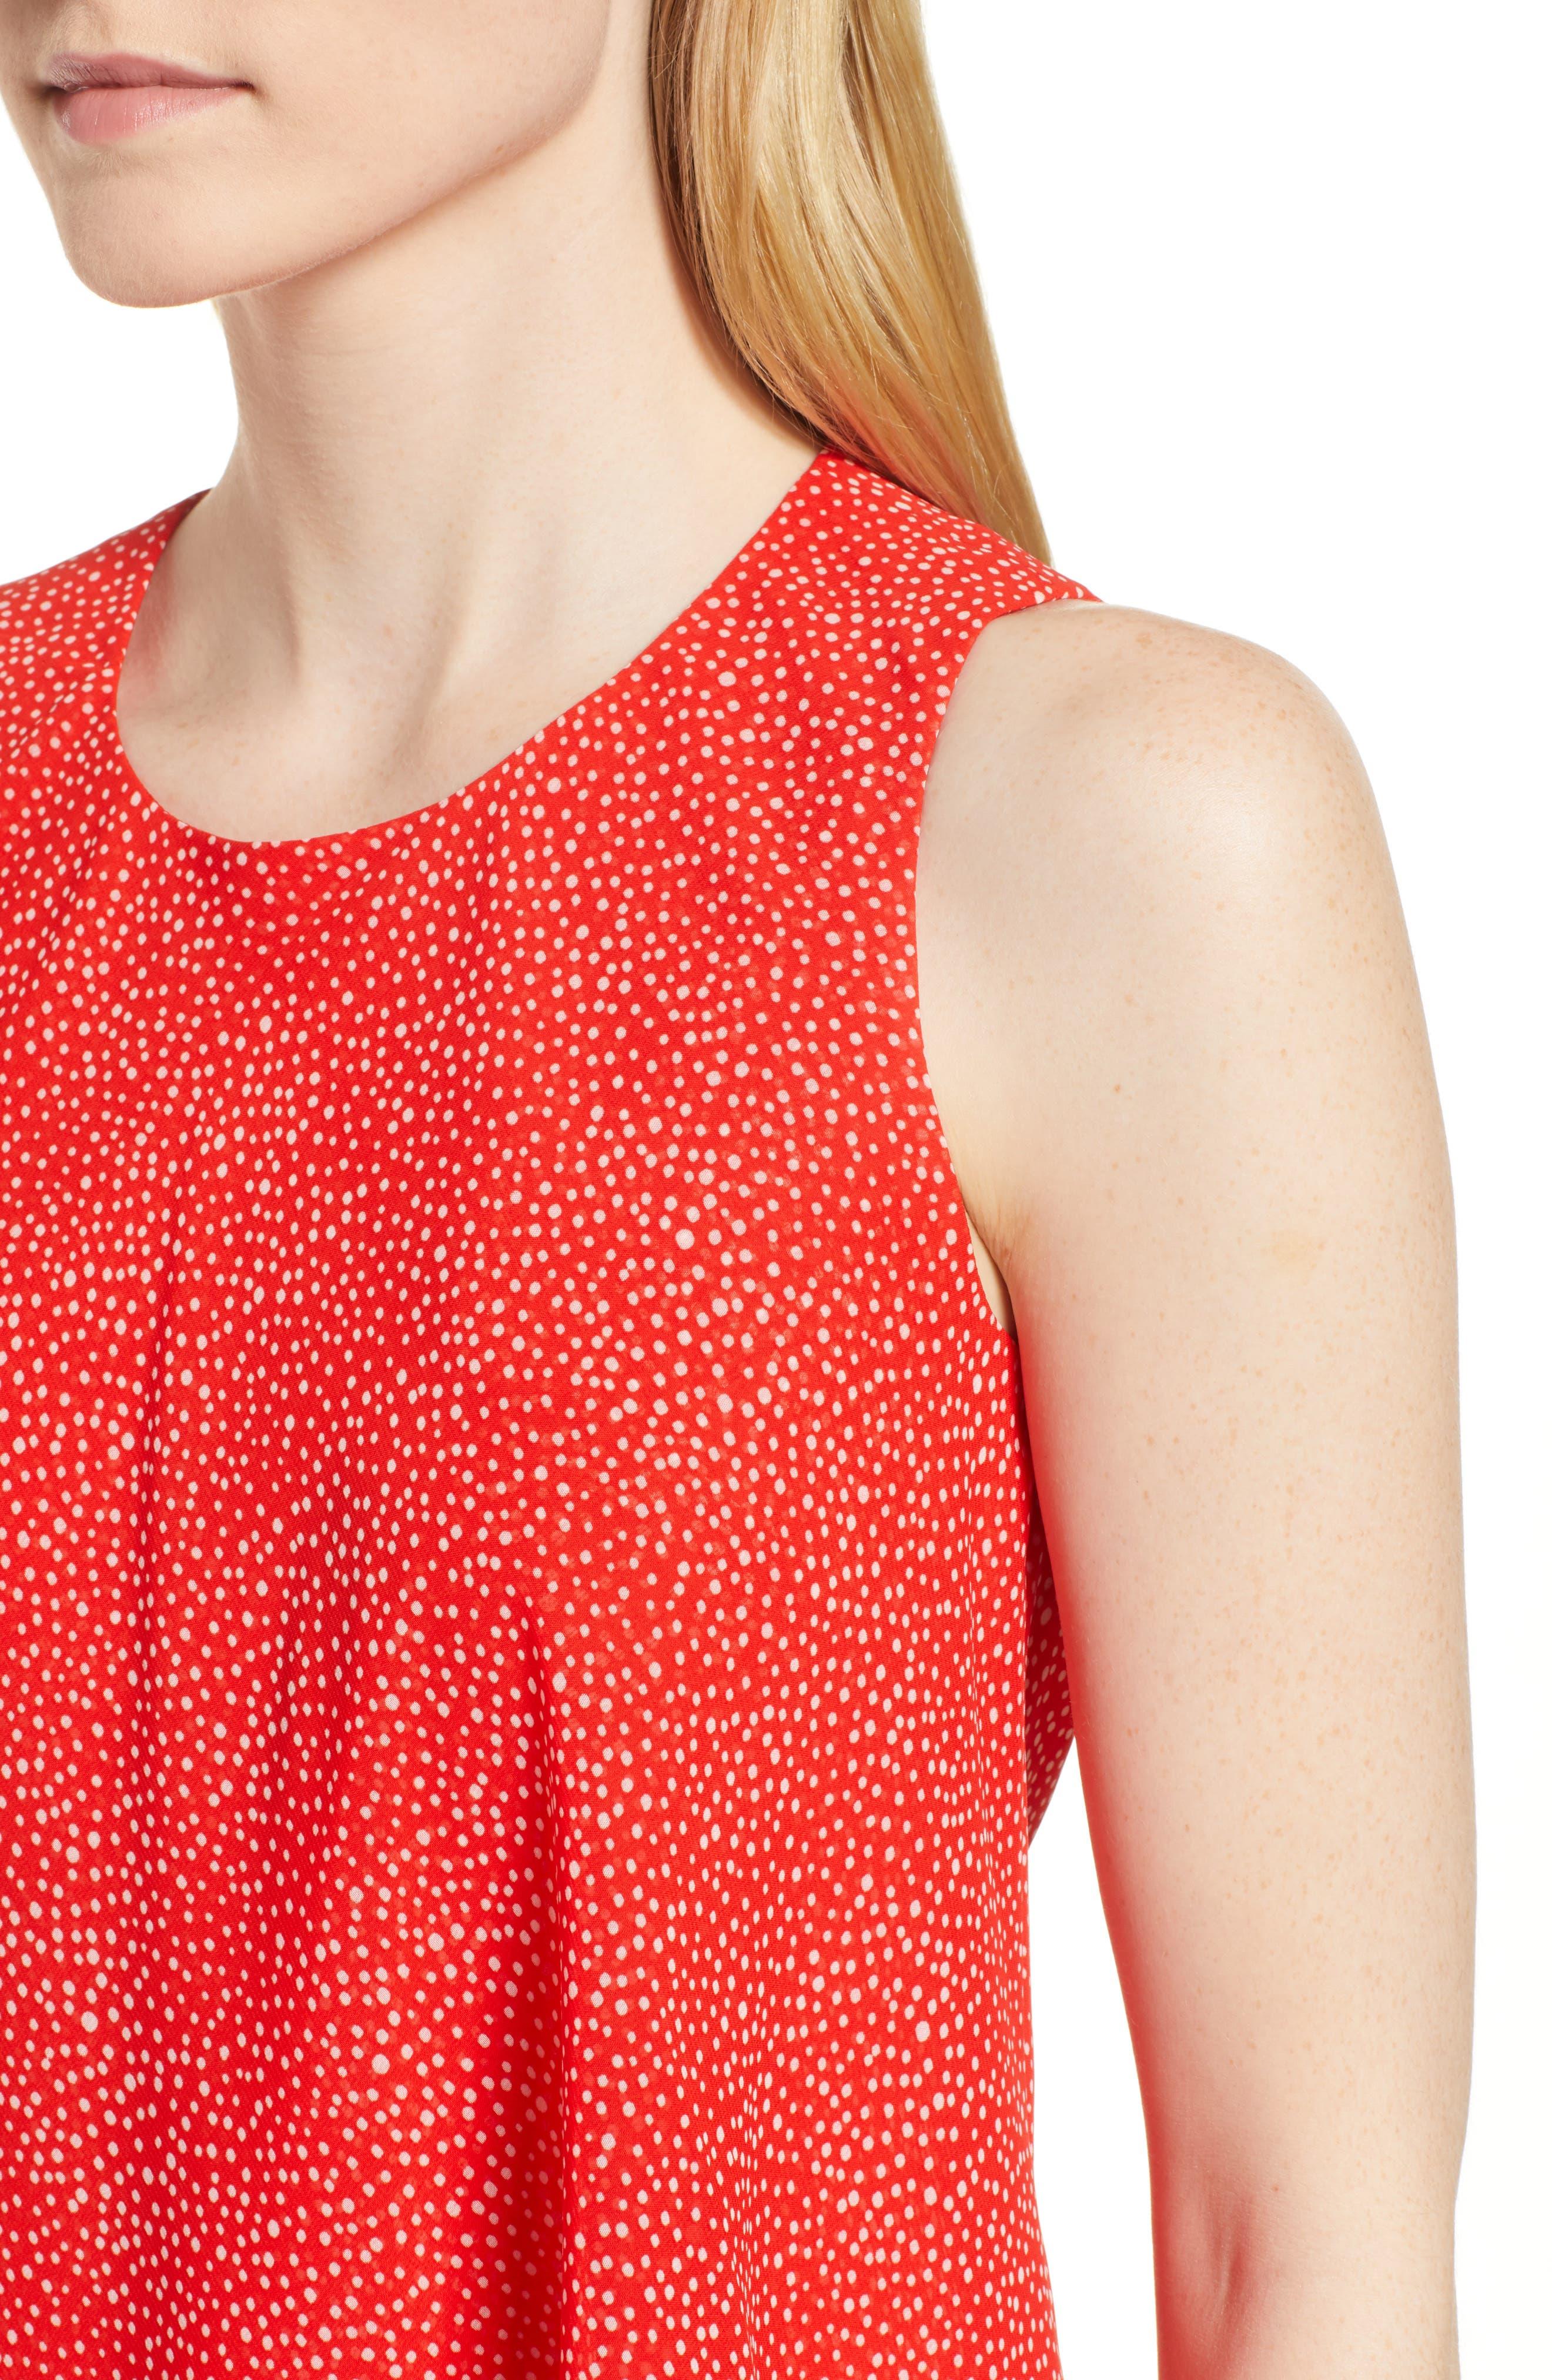 Chiffon Overlay A-Line Dress,                             Alternate thumbnail 4, color,                             Tomato/ White